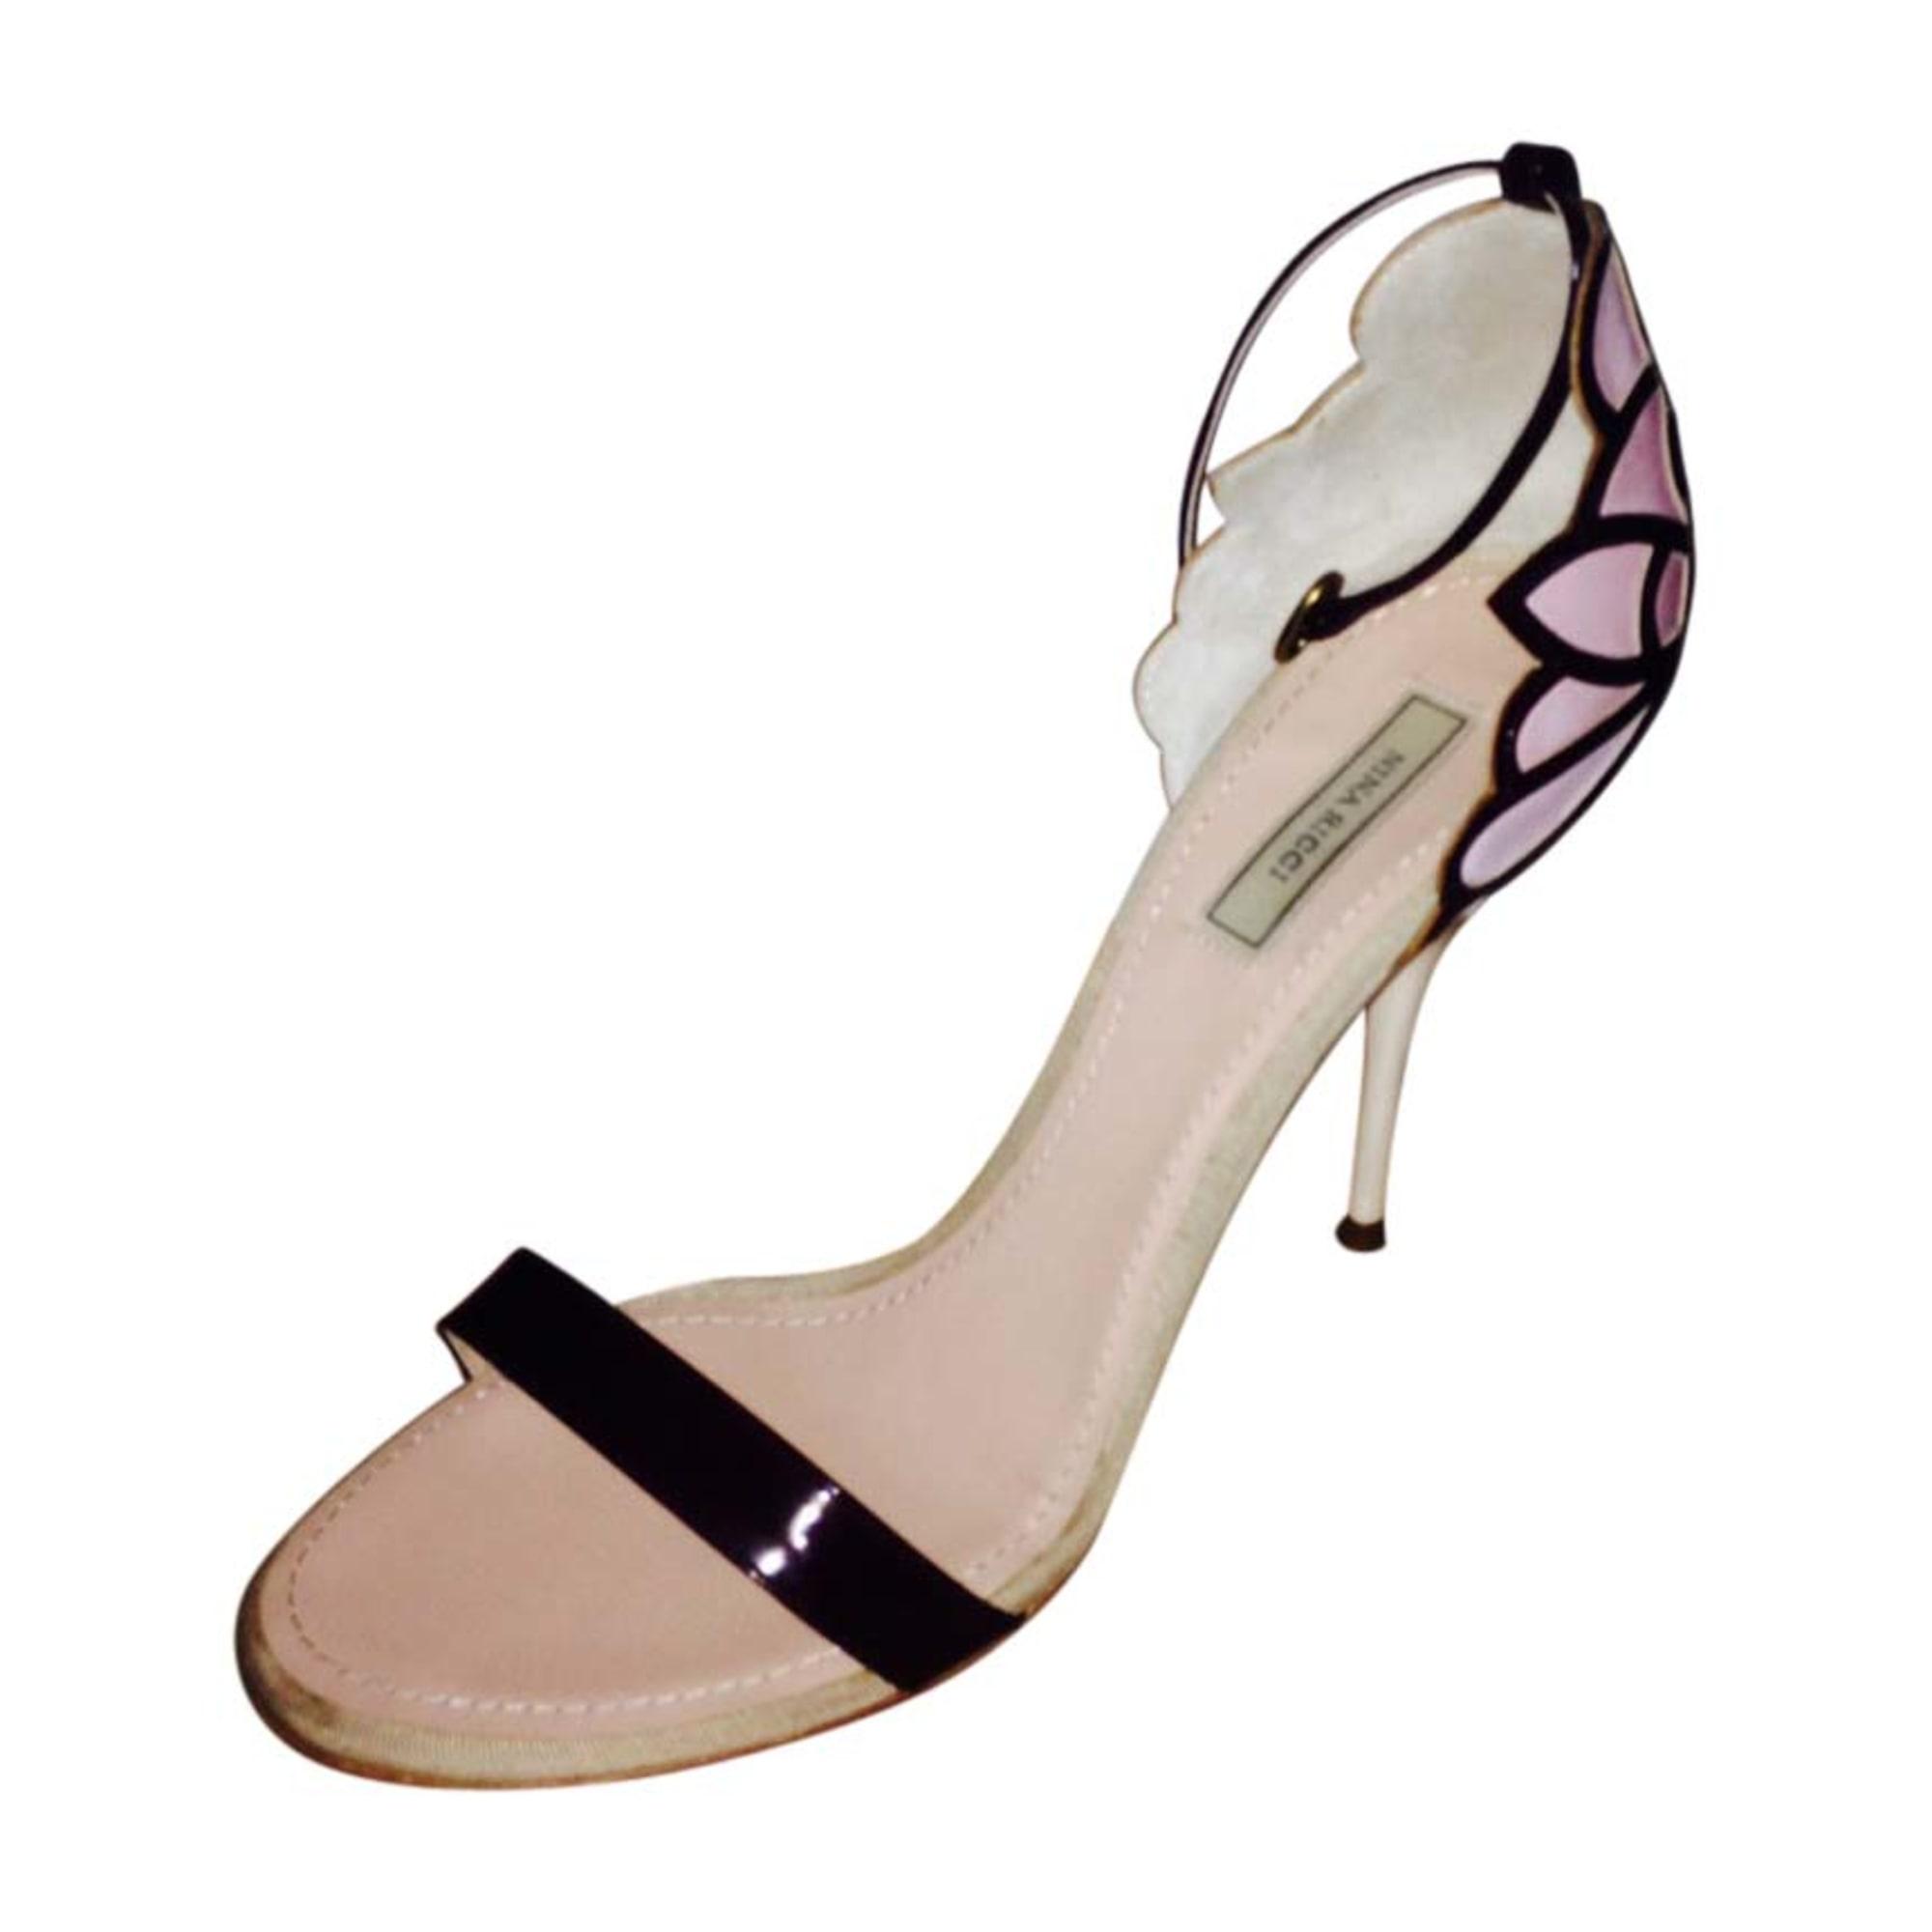 Sandales à talons NINA RICCI Rose, fuschia, vieux rose